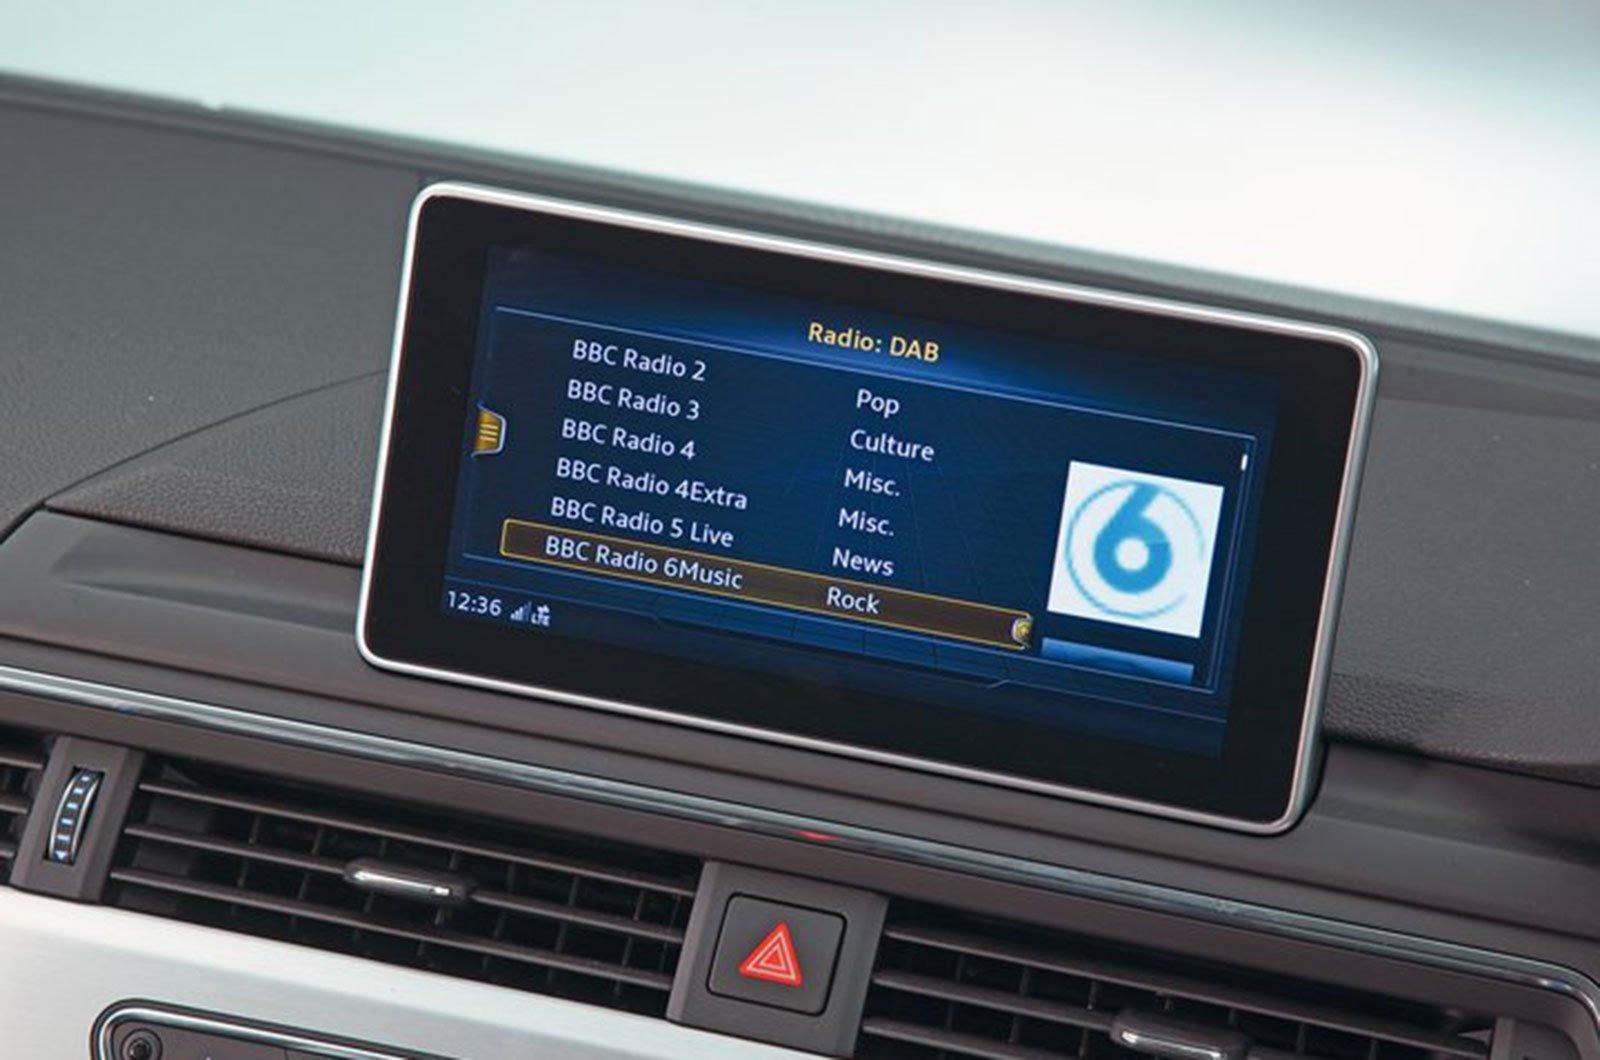 Audi A4 infotainment